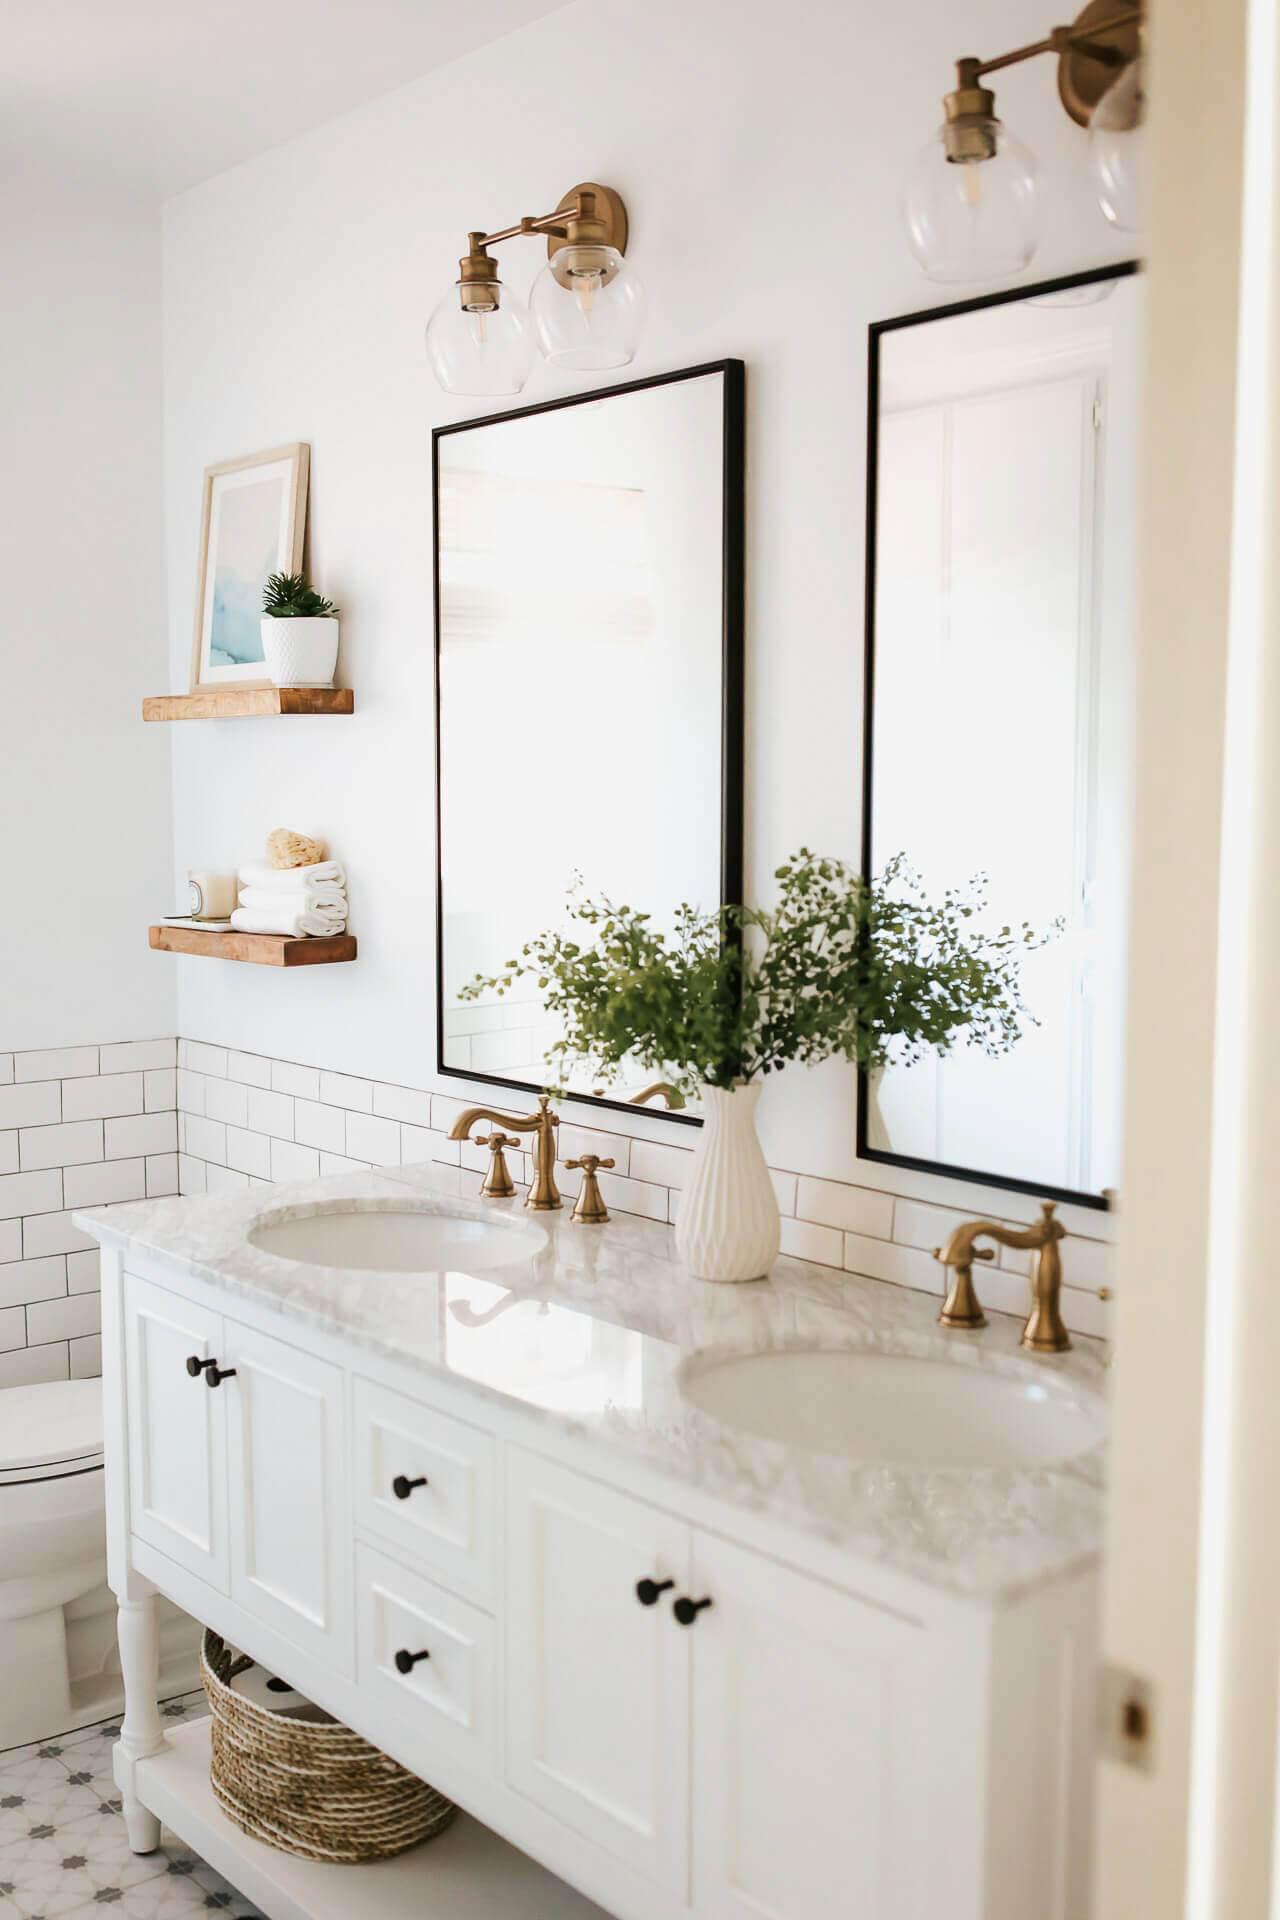 Here's our bathroom design! - M Loves M @marmar